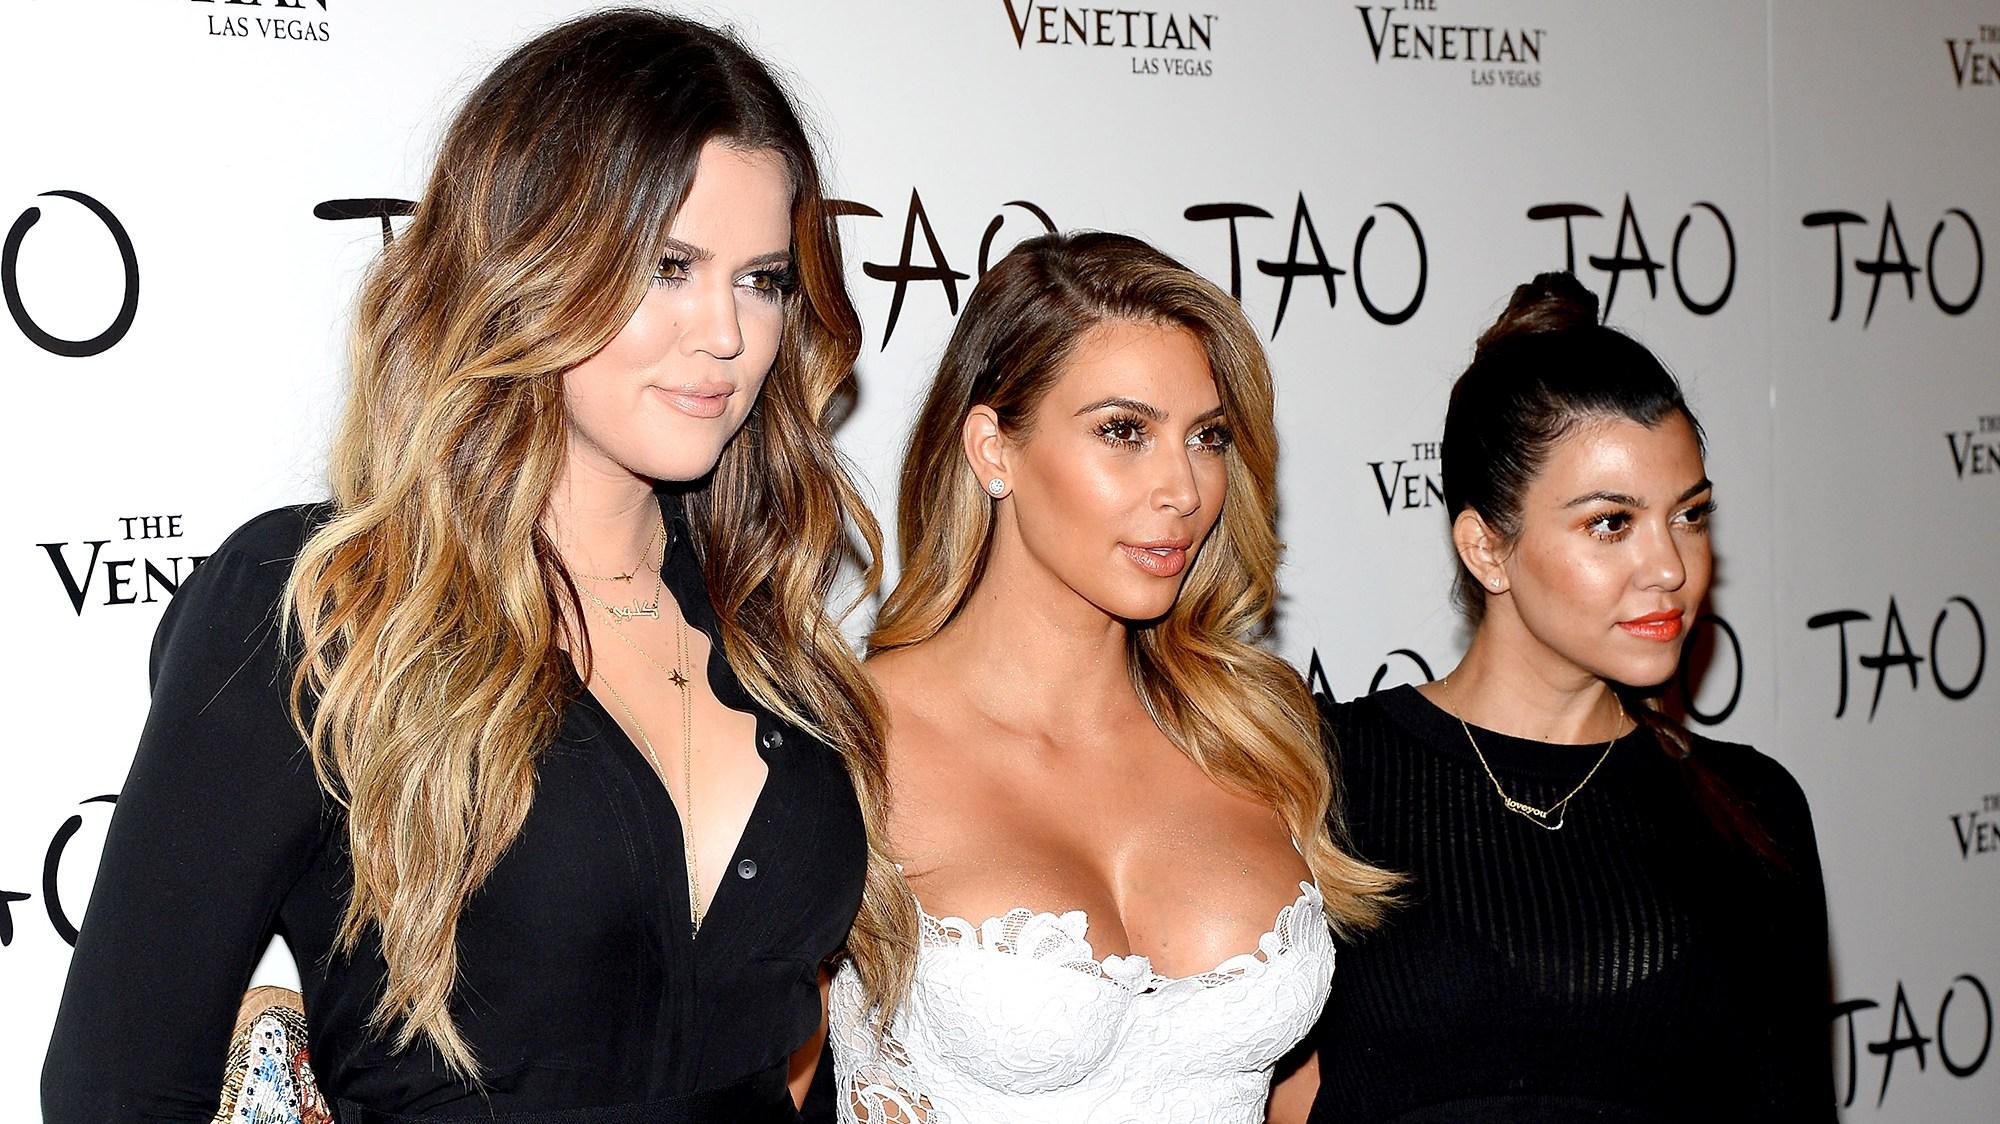 Kourtney Kardashian Kim Kardashian Khloe Kardashian